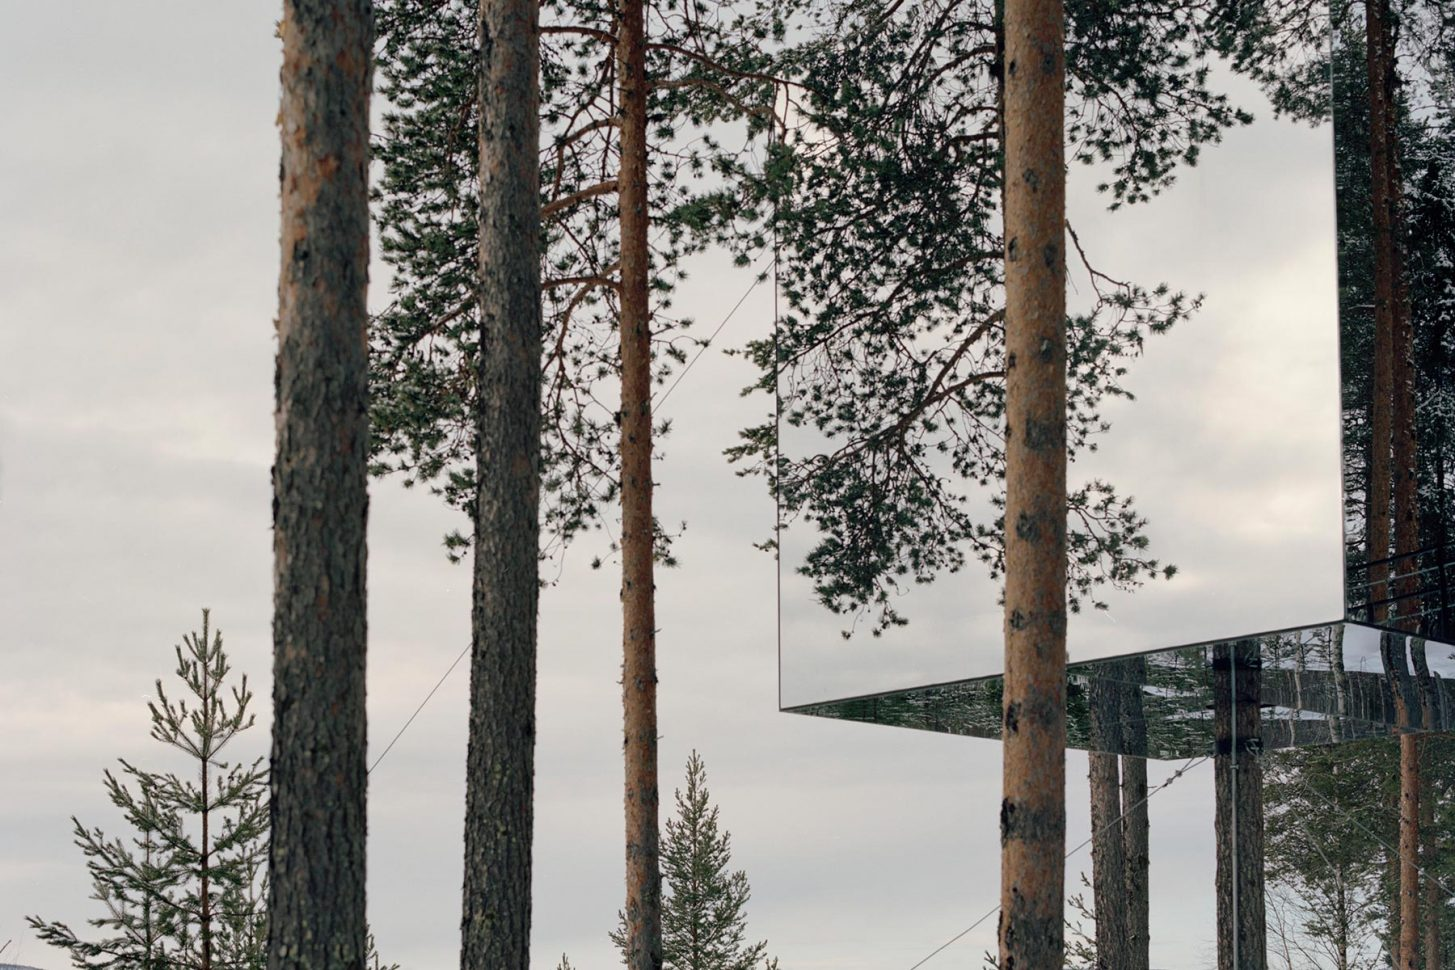 Tree-house-landscape4-1455x970.jpg